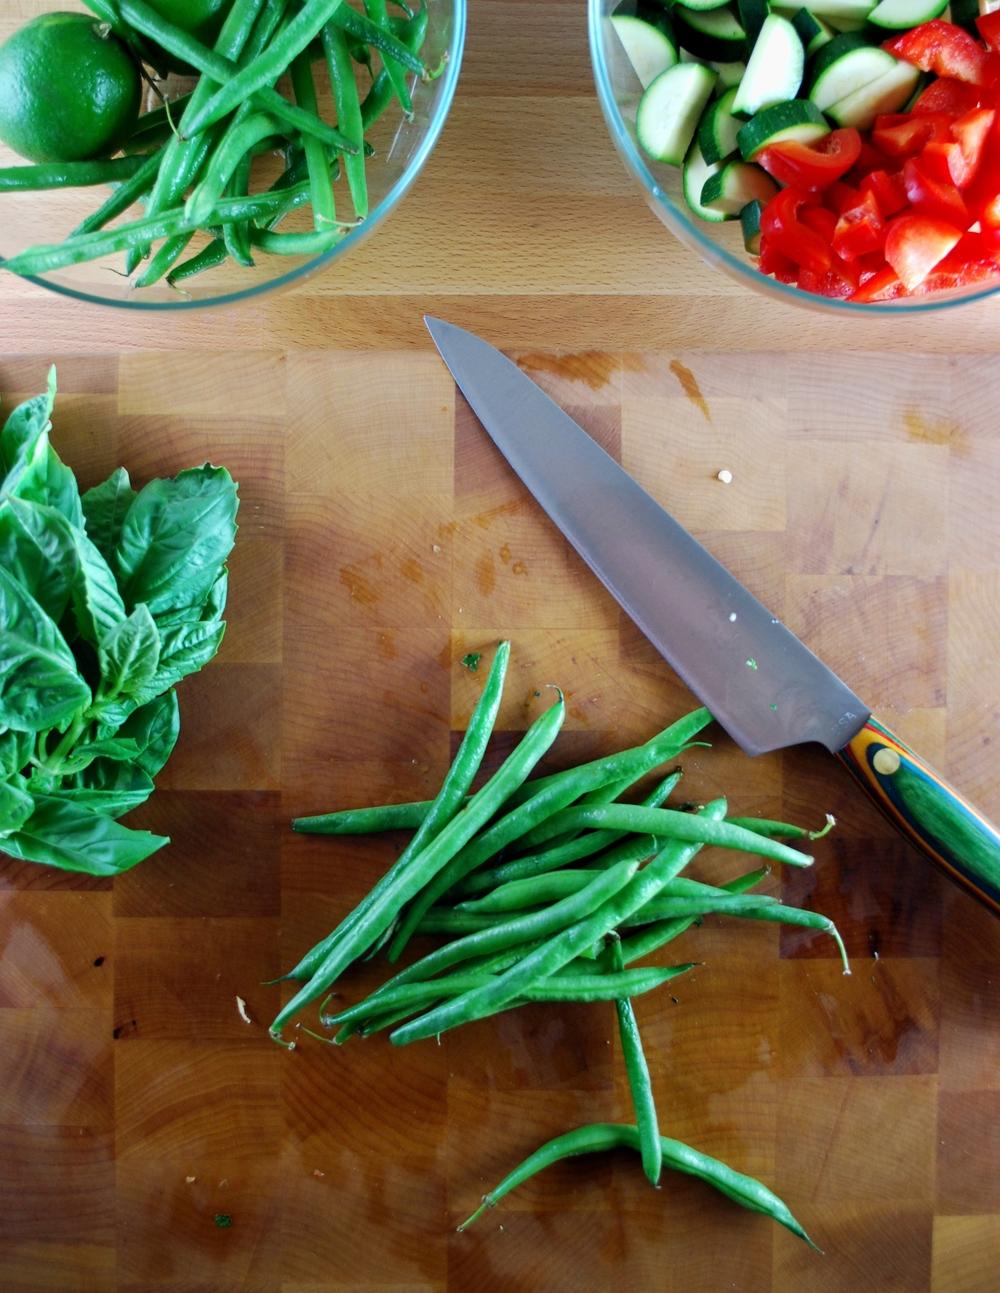 Green Curry Prep 2.JPG